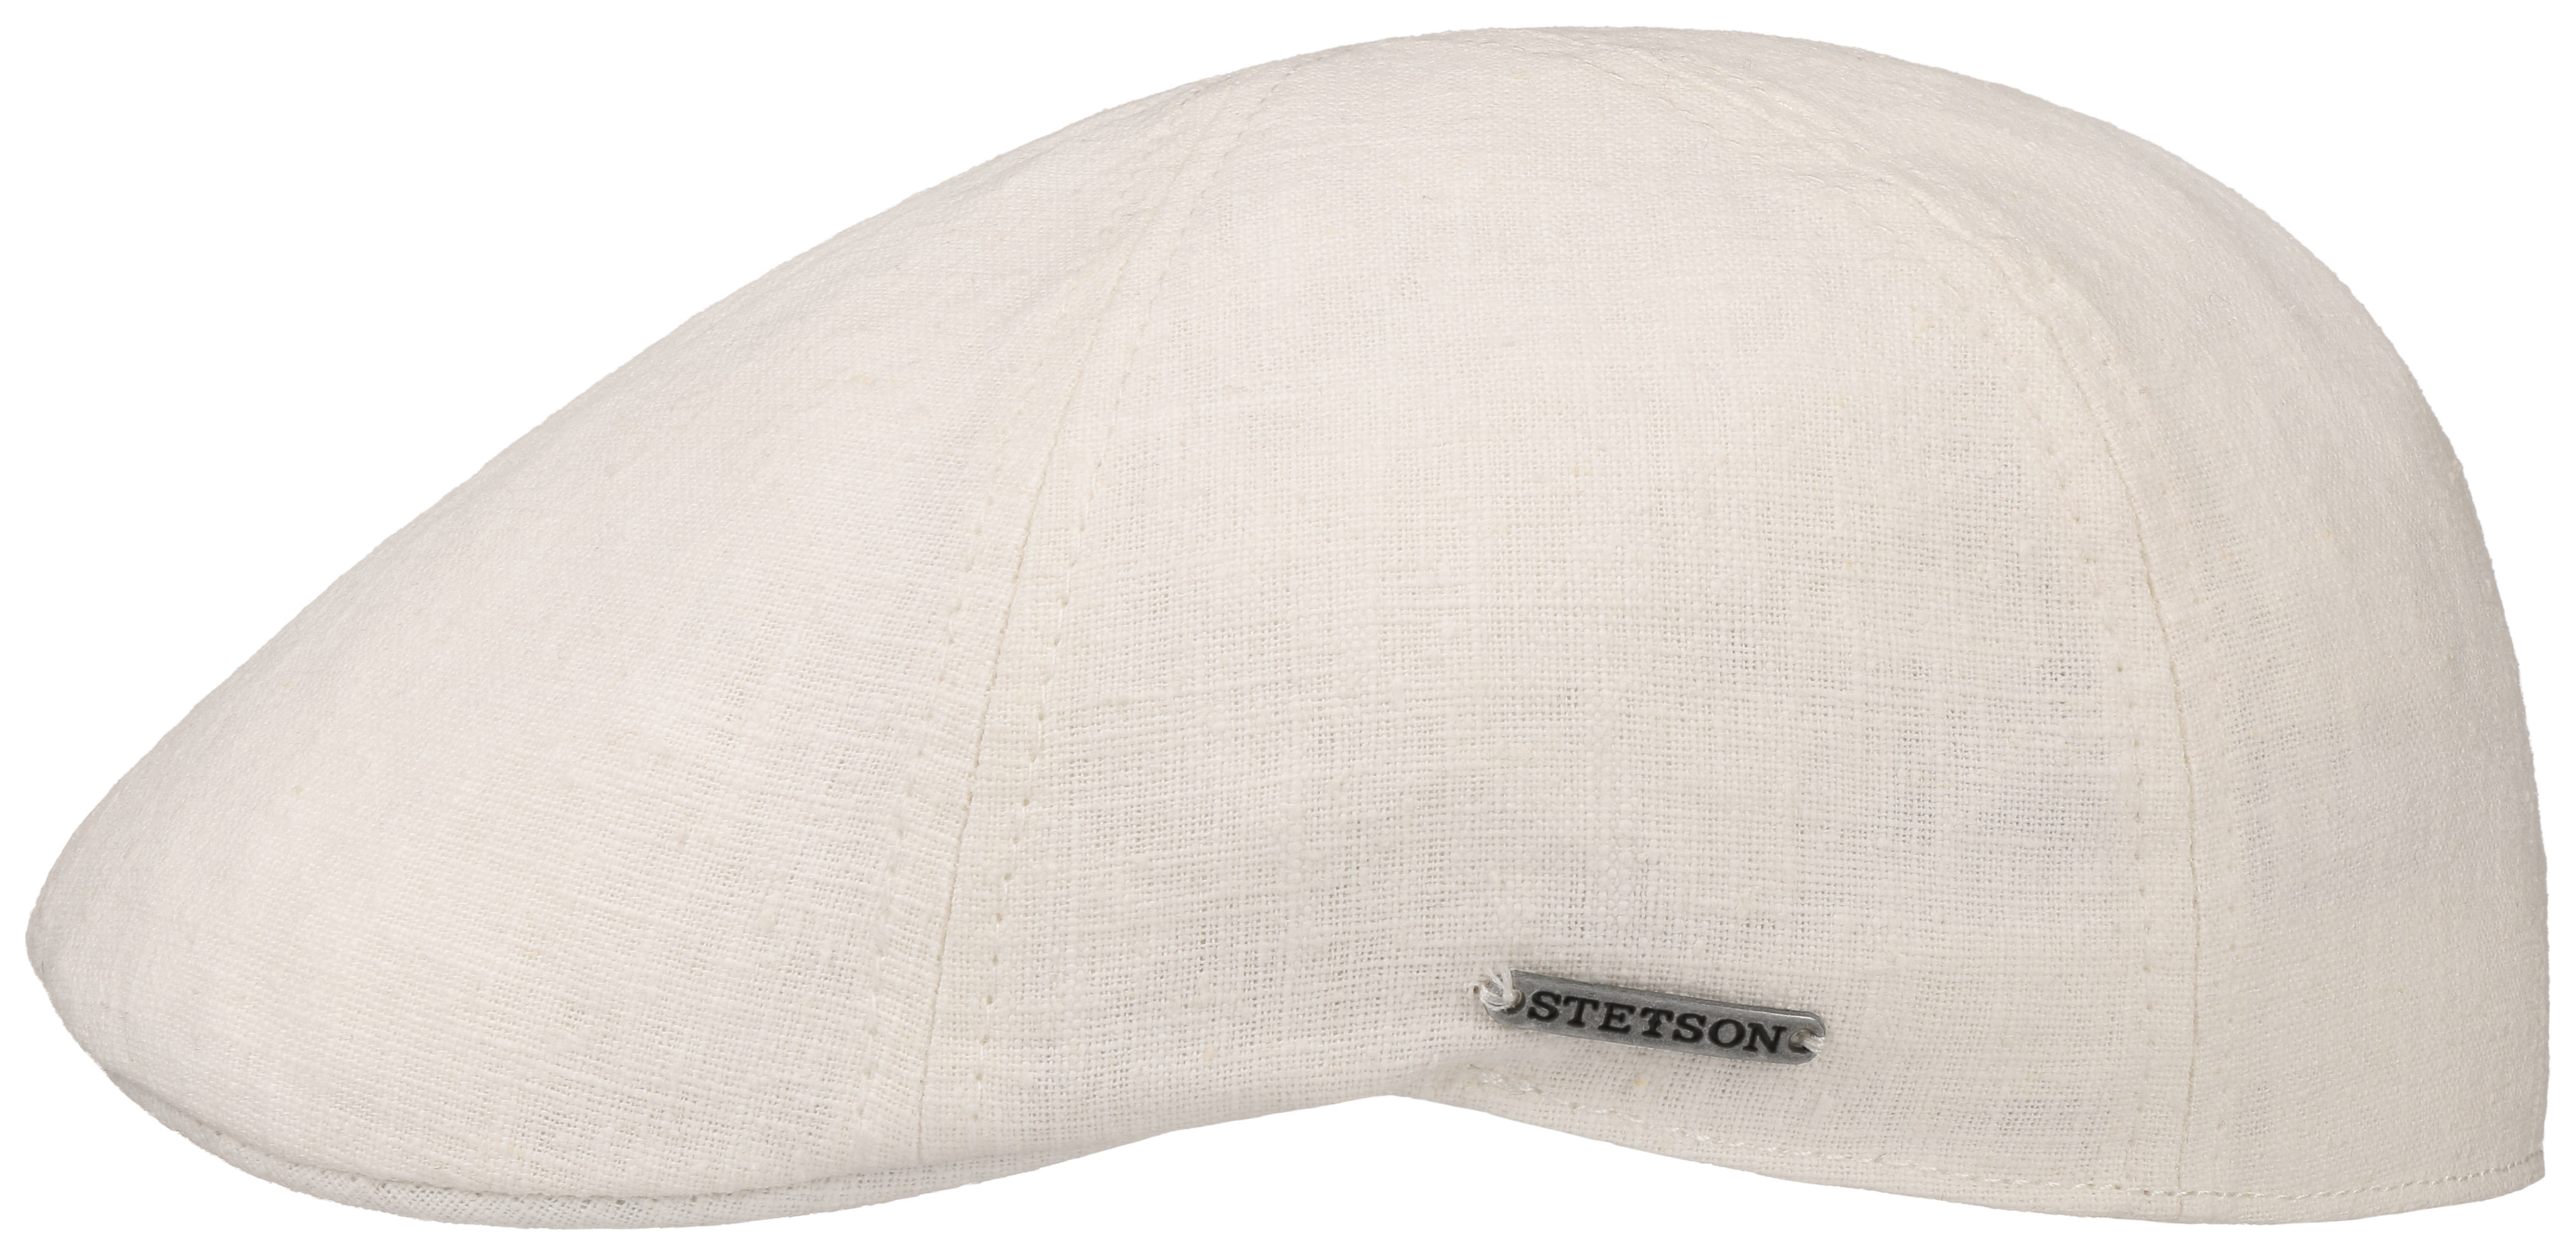 Stetson - Stetson Texas Ramie Vintage Ecru Hat